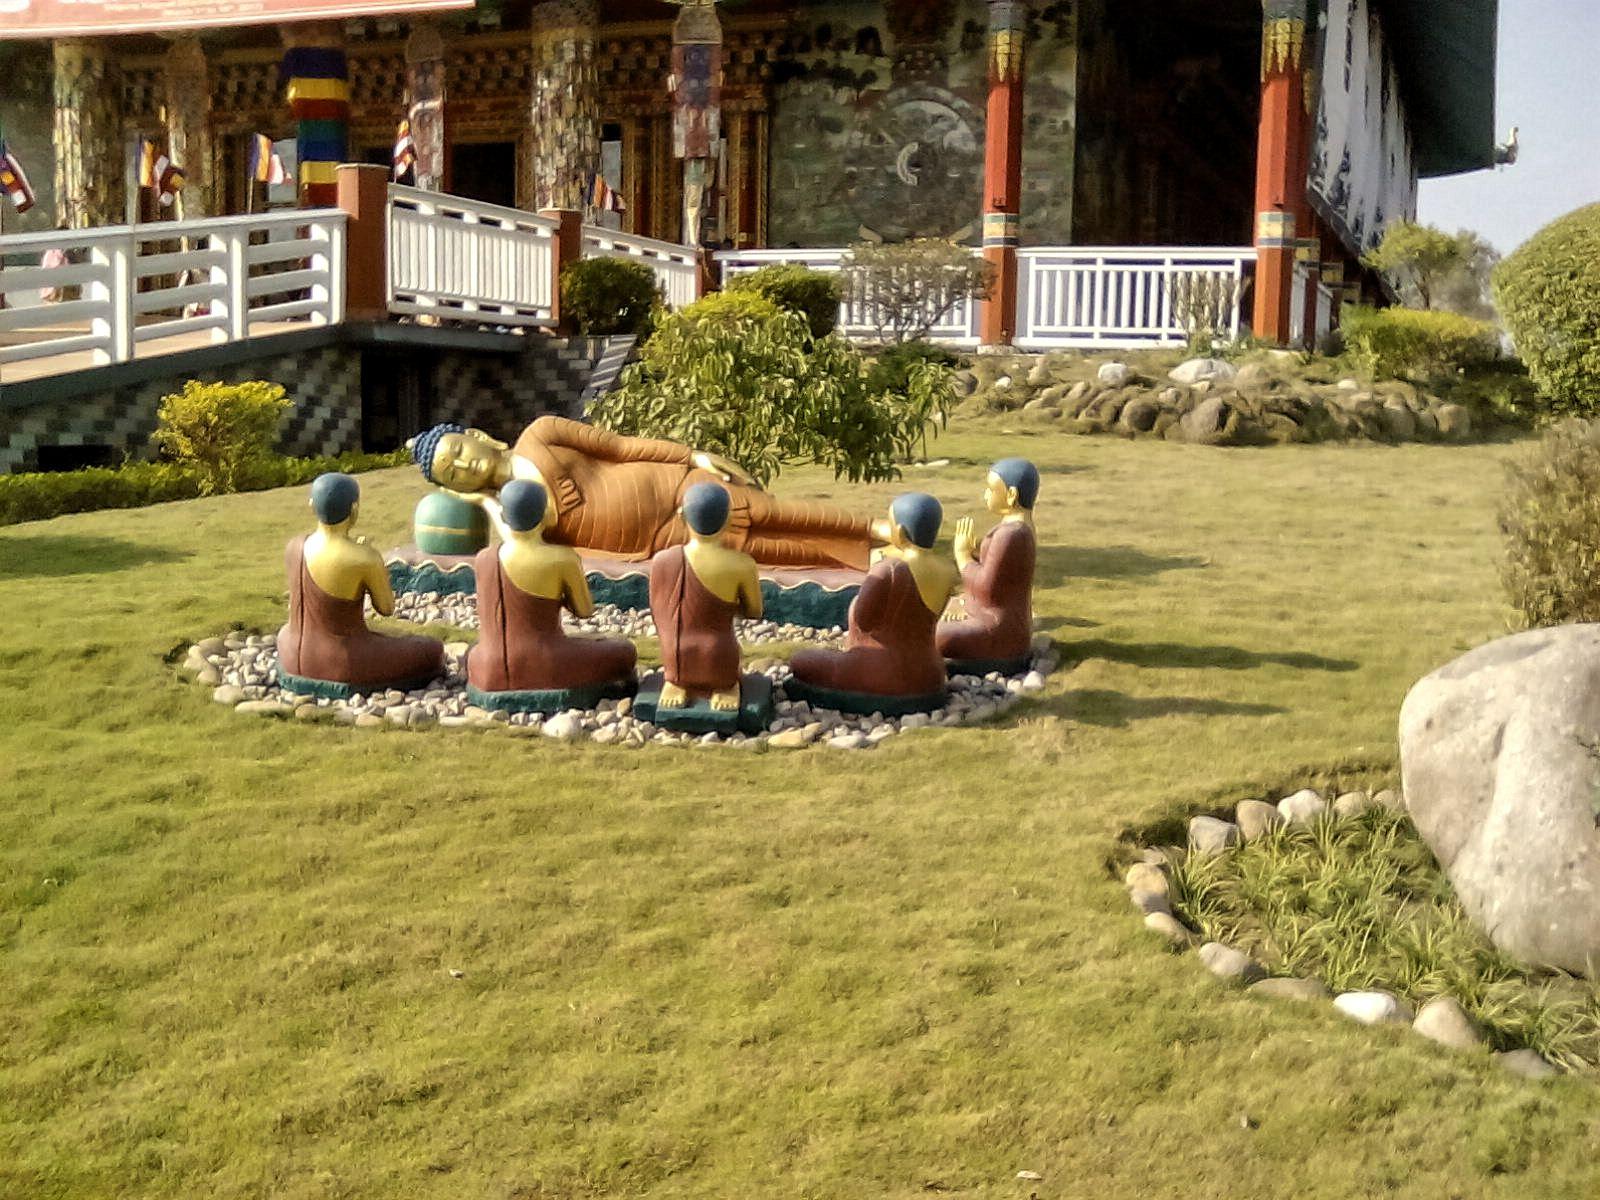 lumbini temple bouddha statues deco culture visite nepal